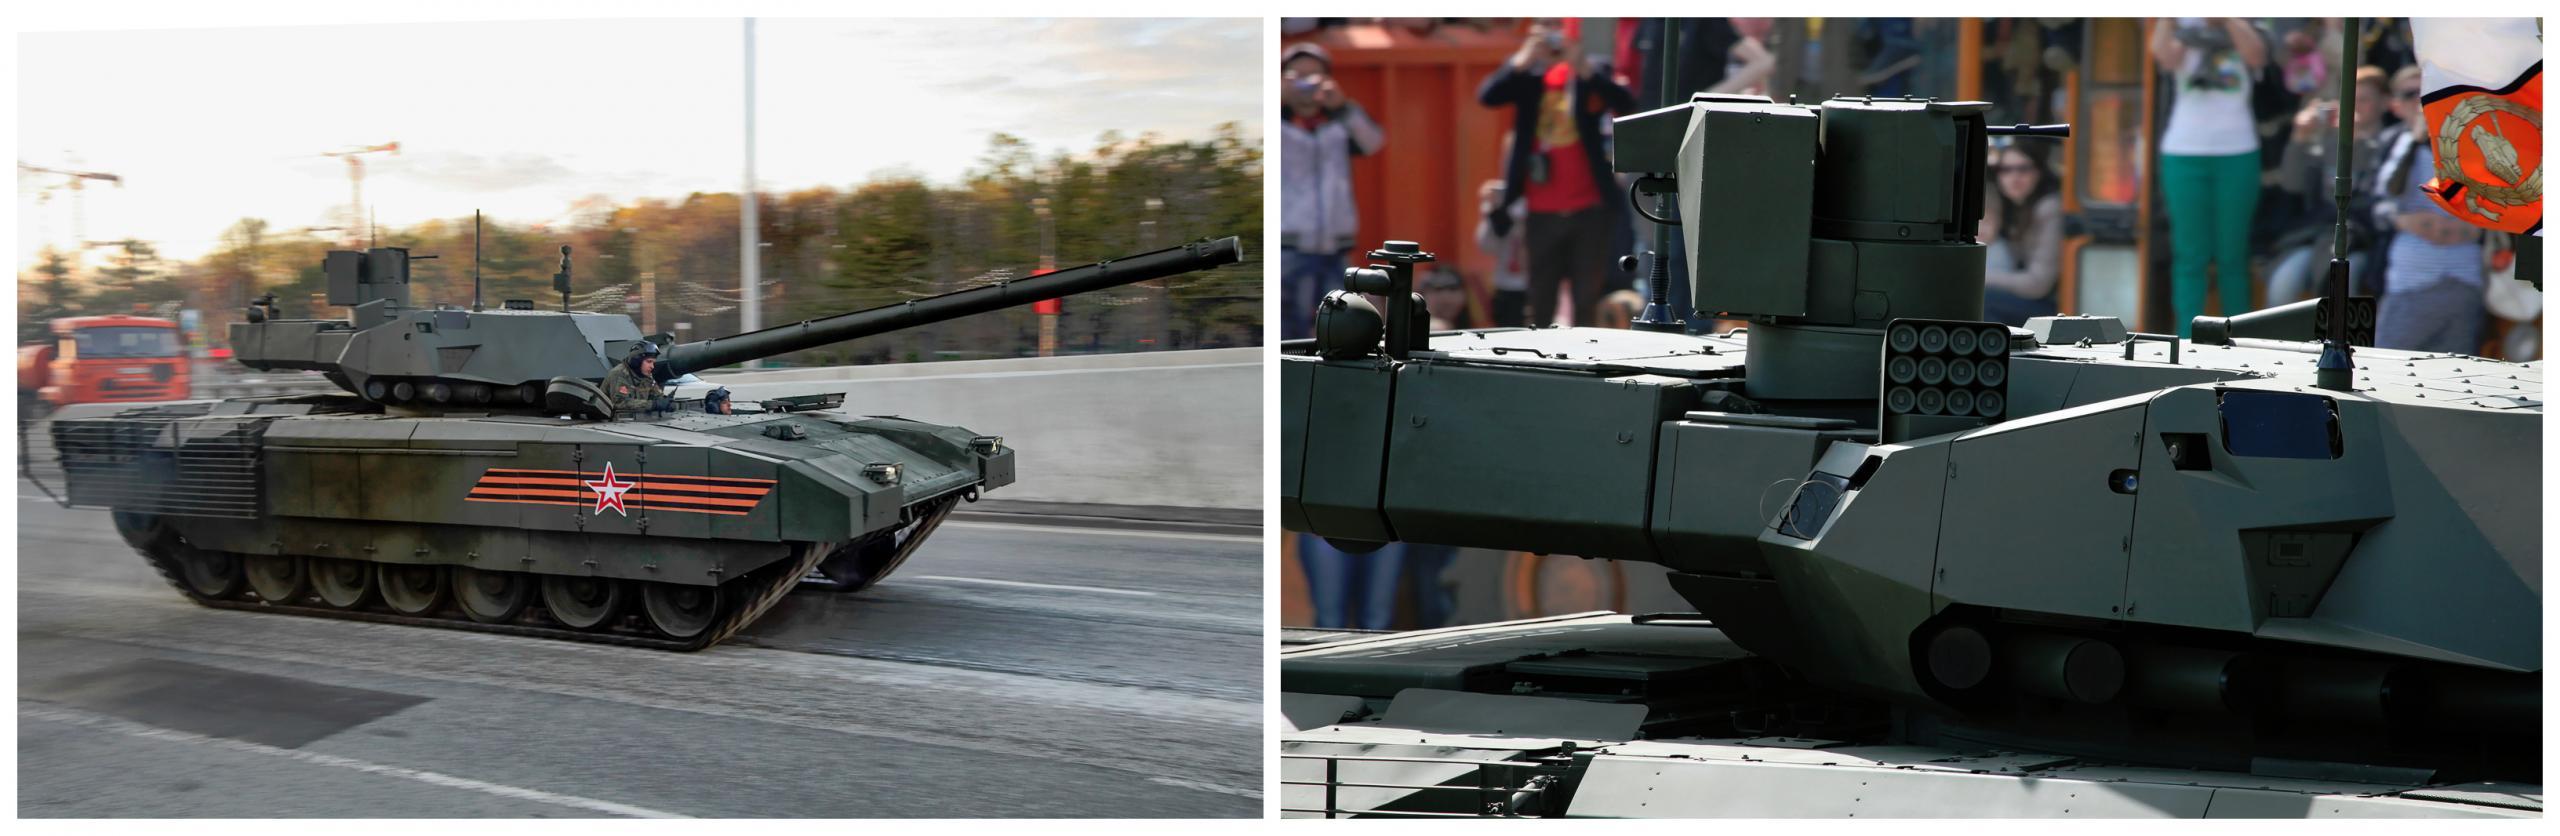 Armata T-14, vir: Wikipedia